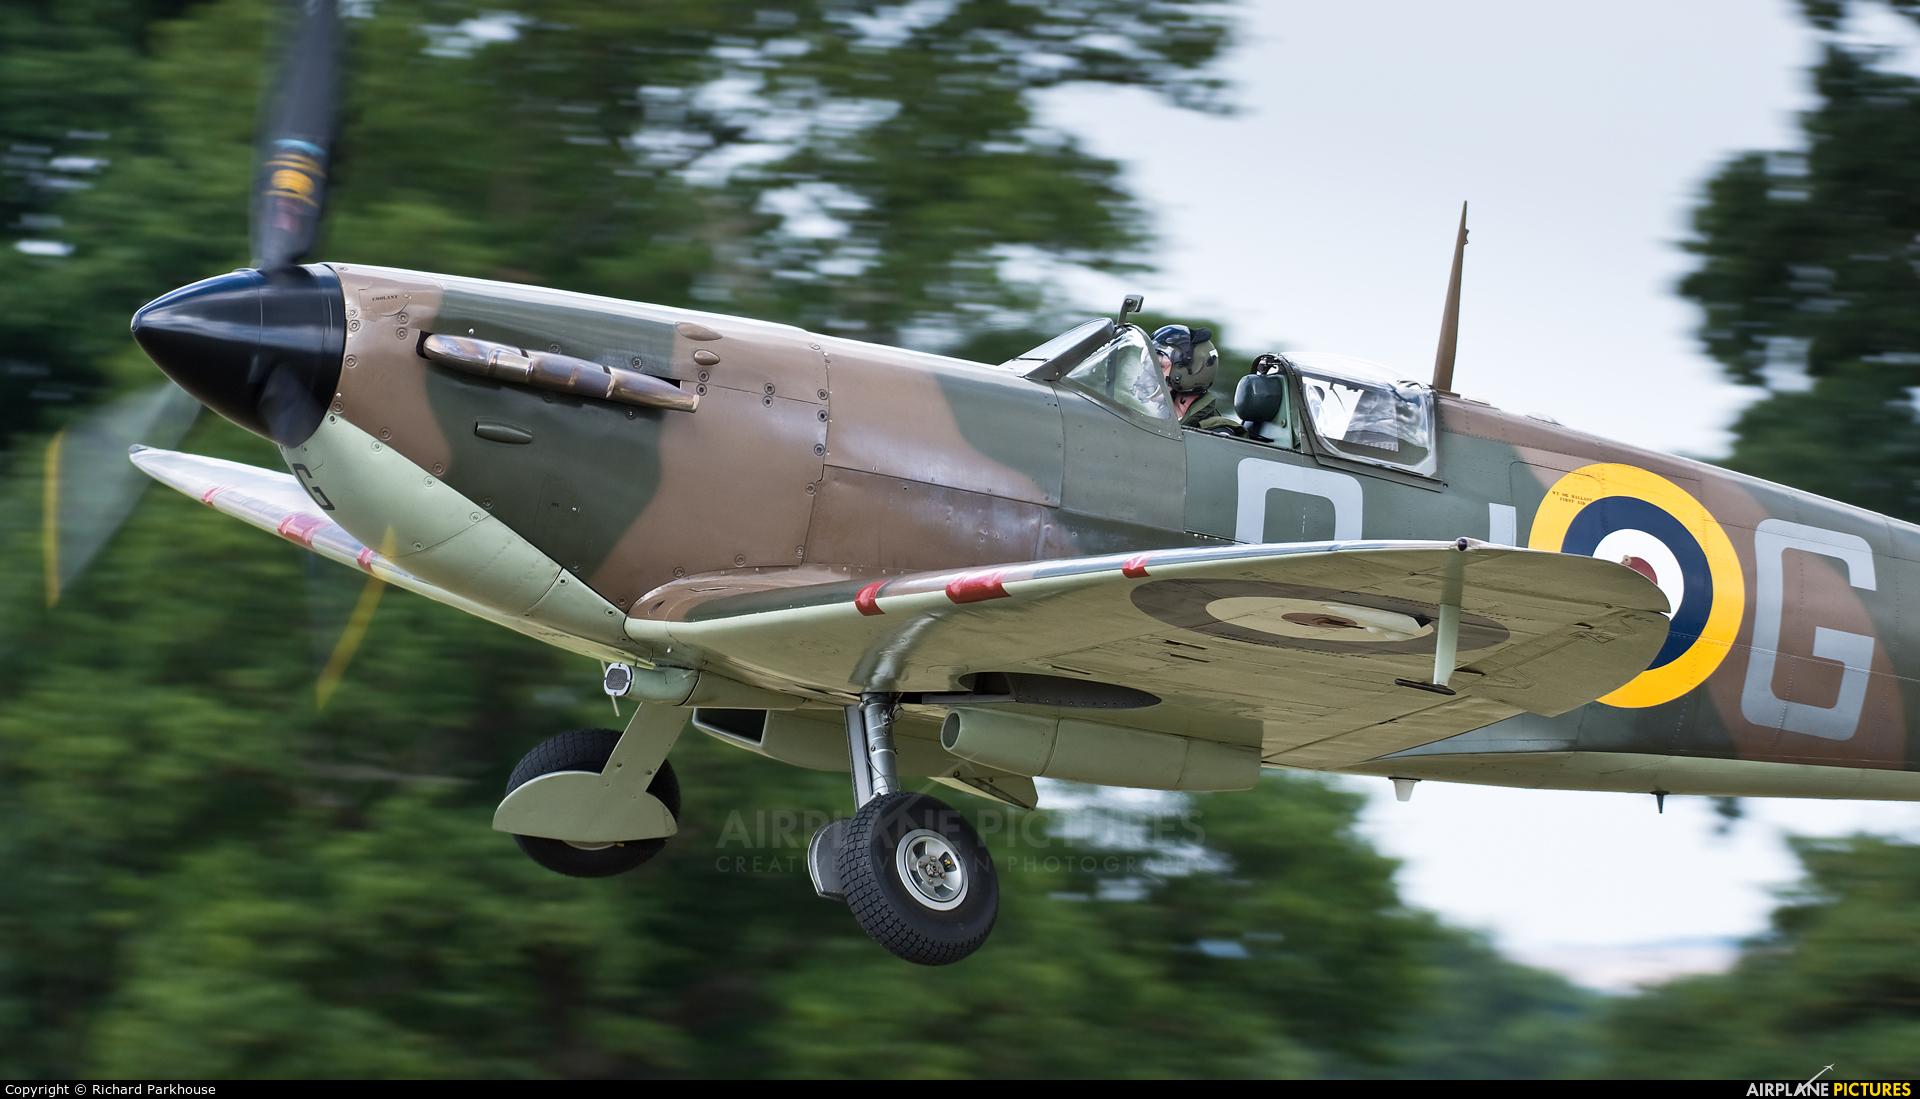 "Royal Air Force ""Battle of Britain Memorial Flight"" P7350 aircraft at Lashenden / Headcorn"